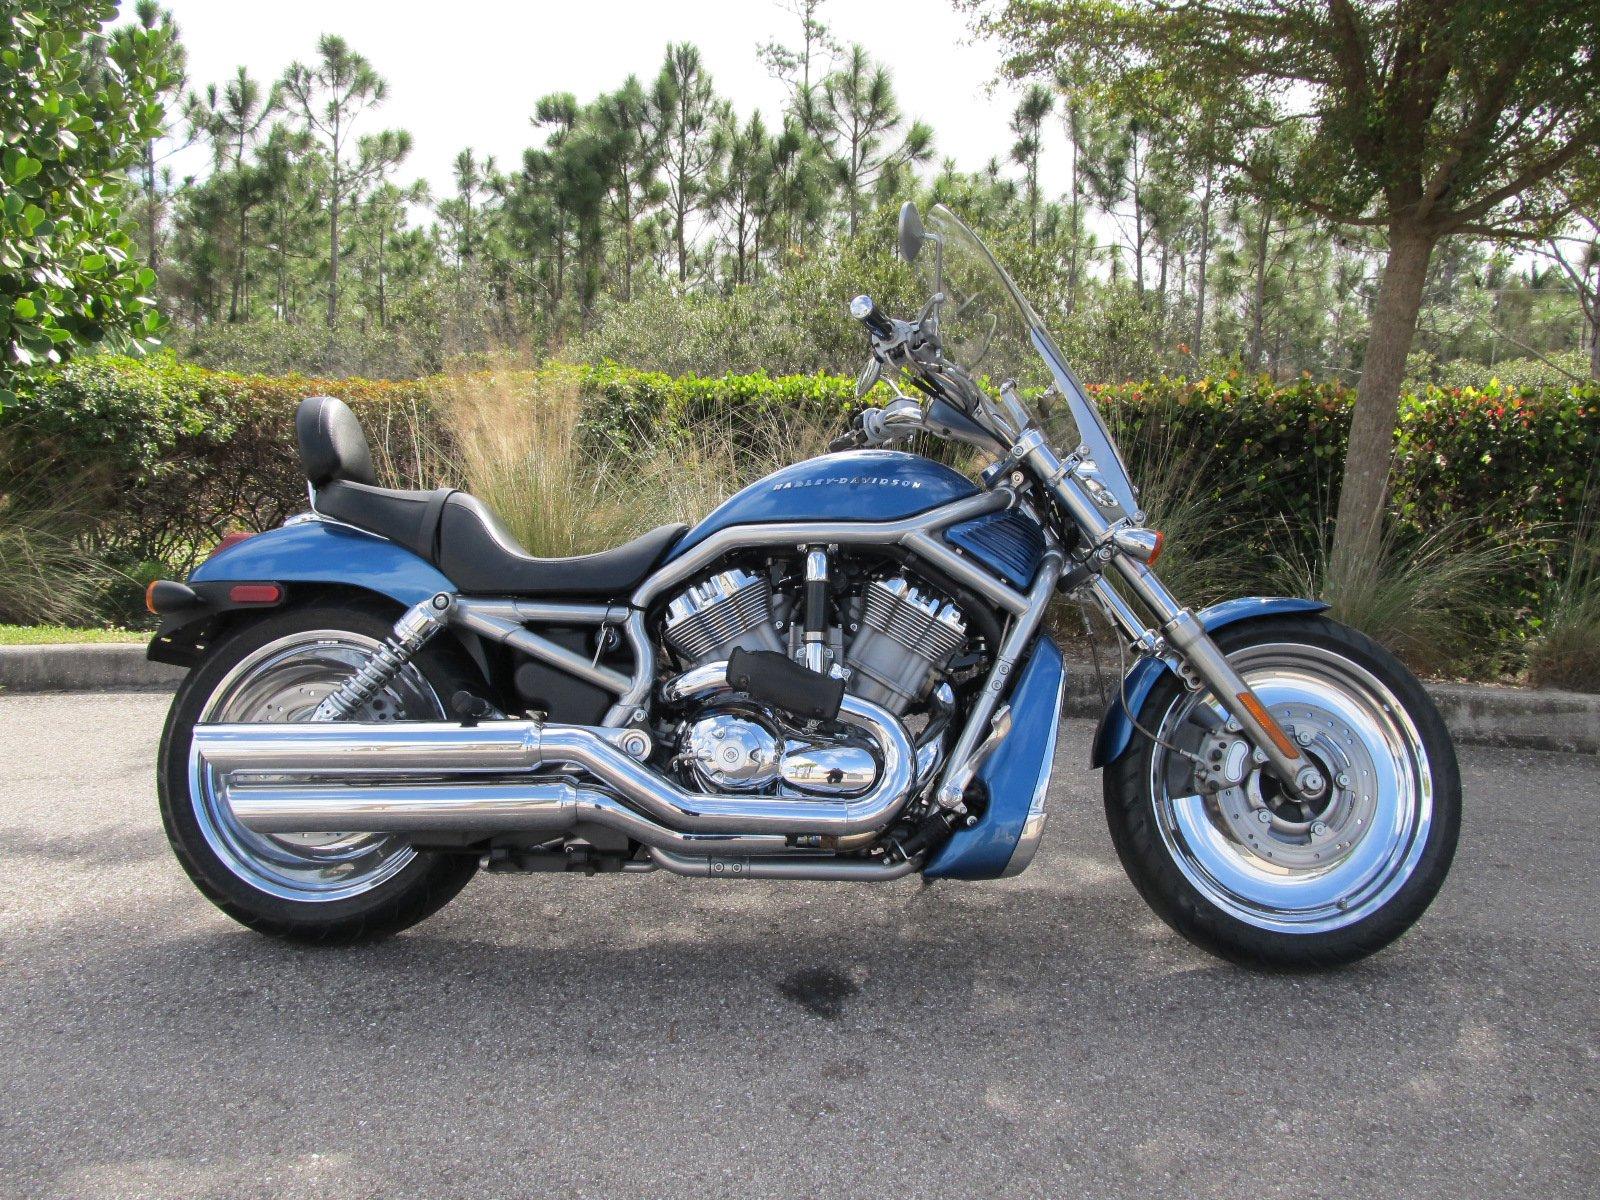 Pre-Owned 2005 Harley-Davidson V-Rod VRSCA